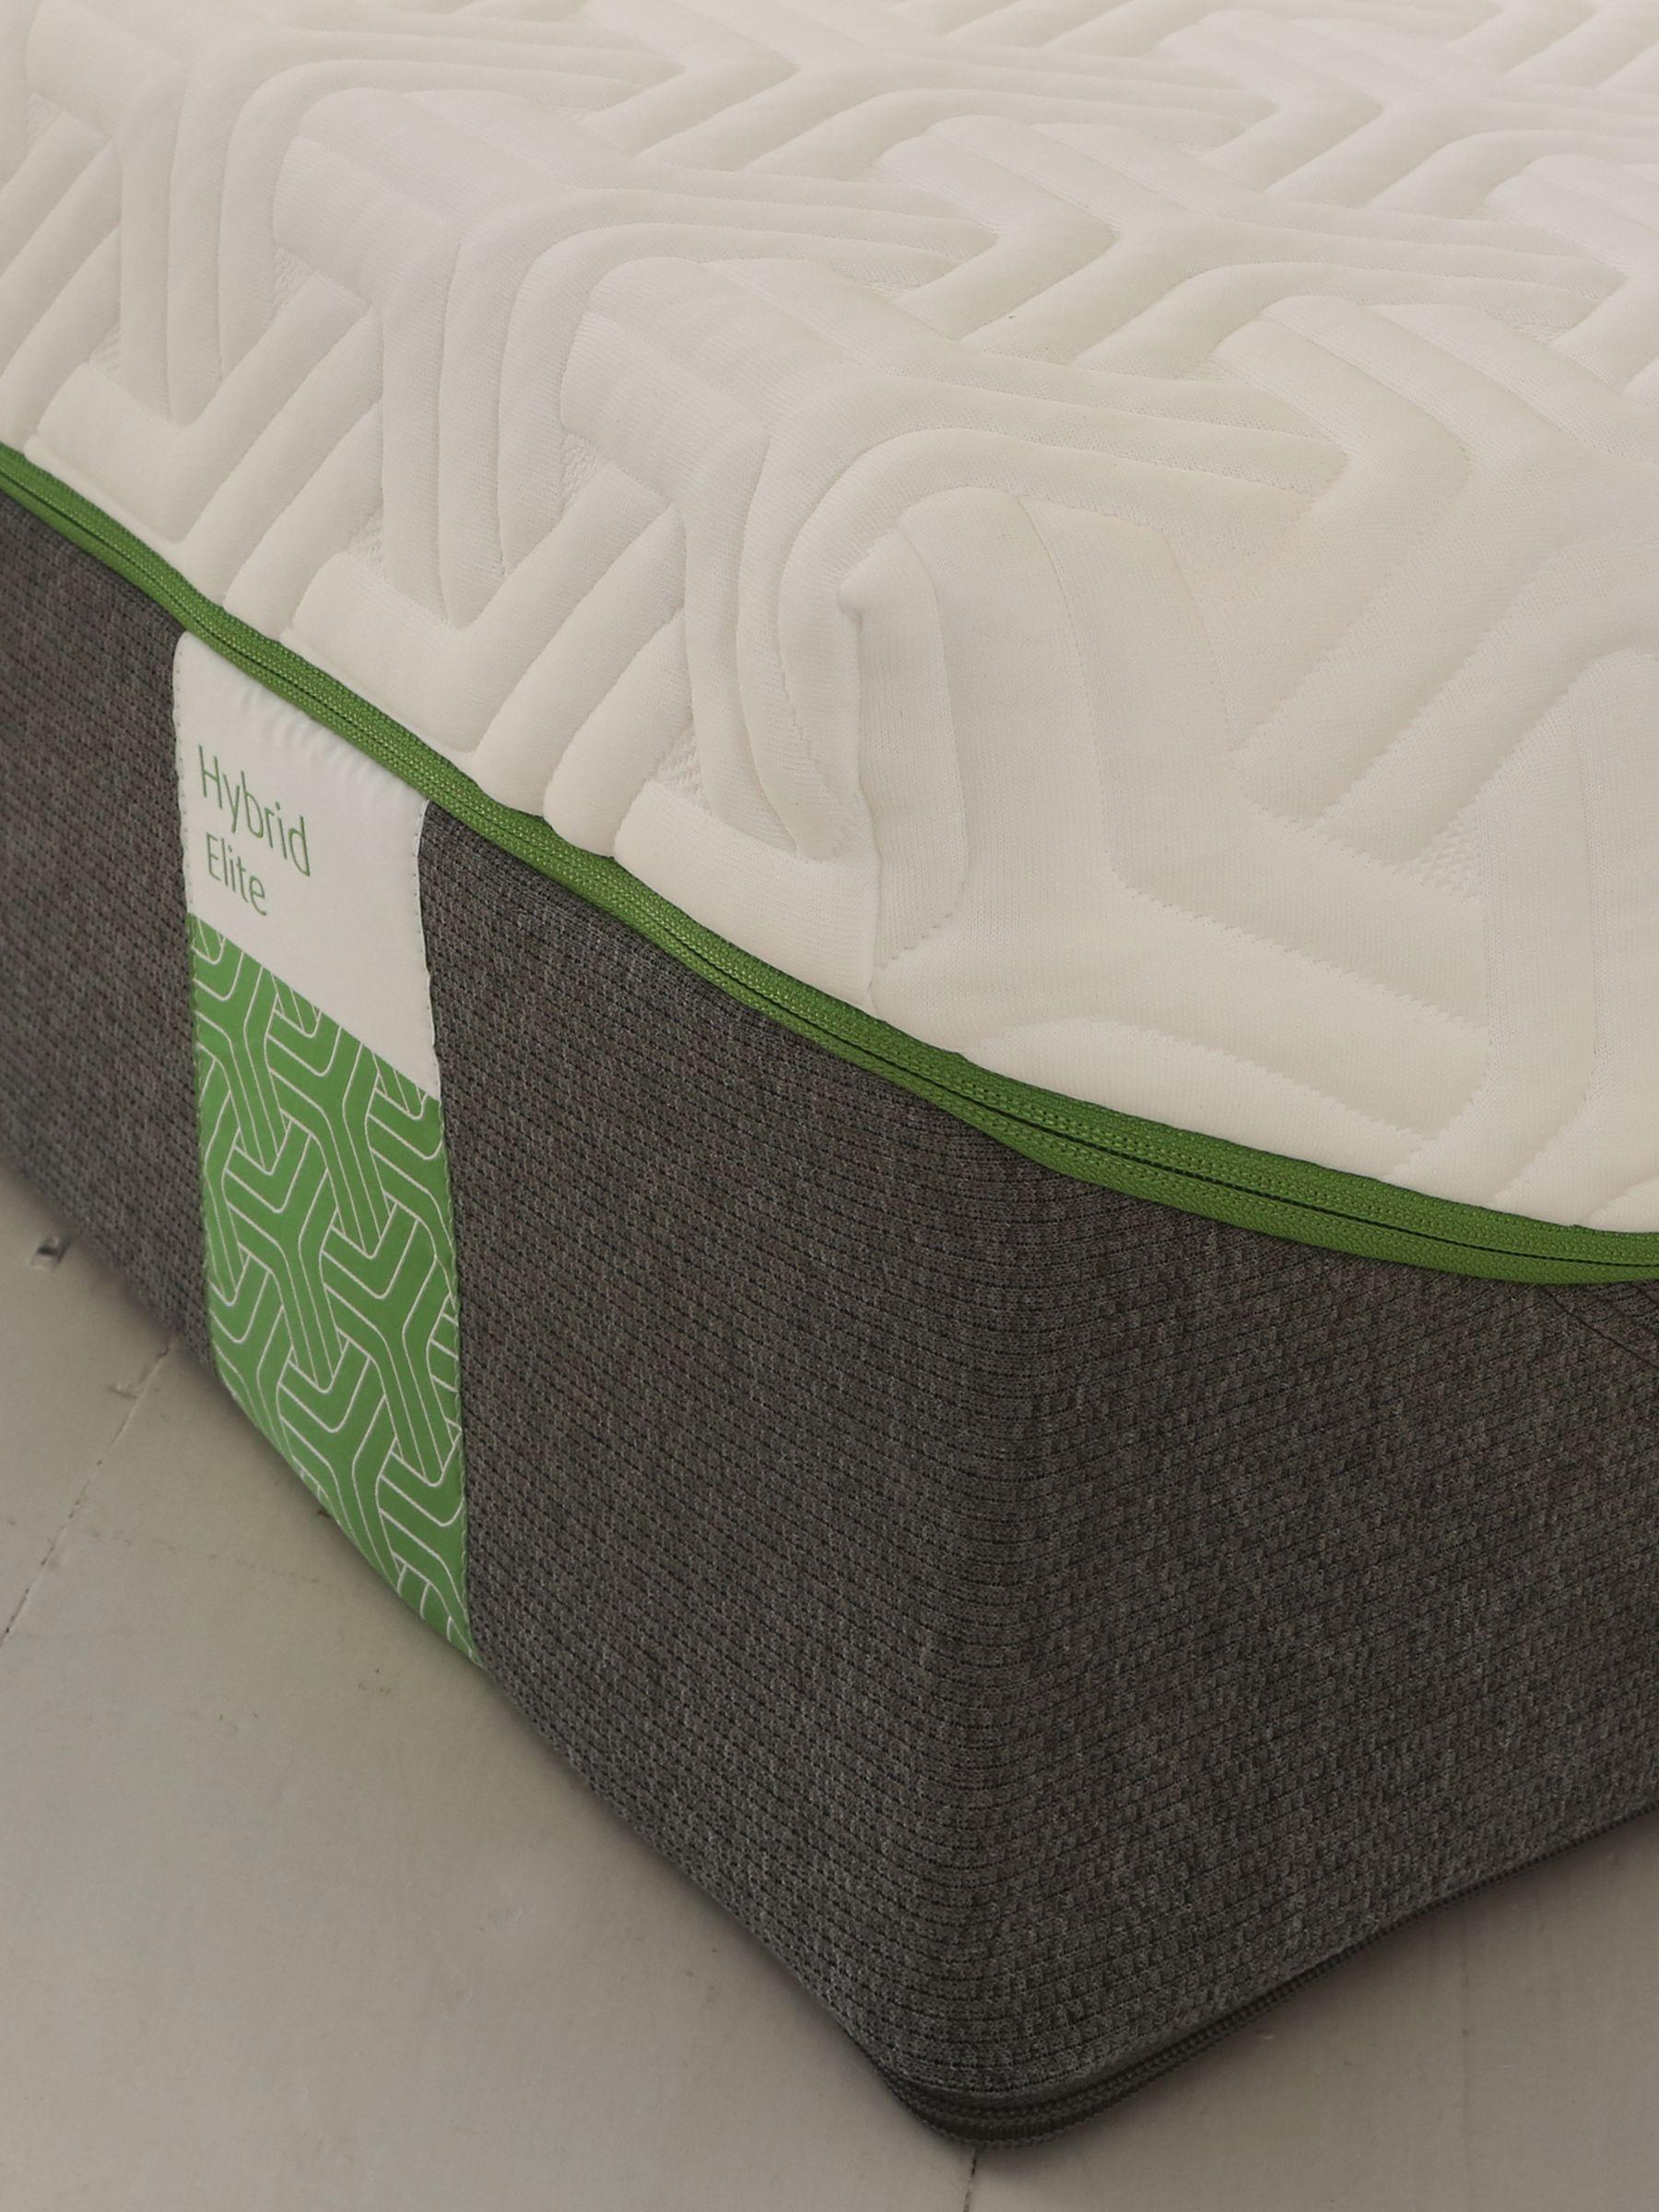 Tempur Tempur Hybrid Elite 25 Pocket Spring Memory Foam Mattress, Medium, King Size